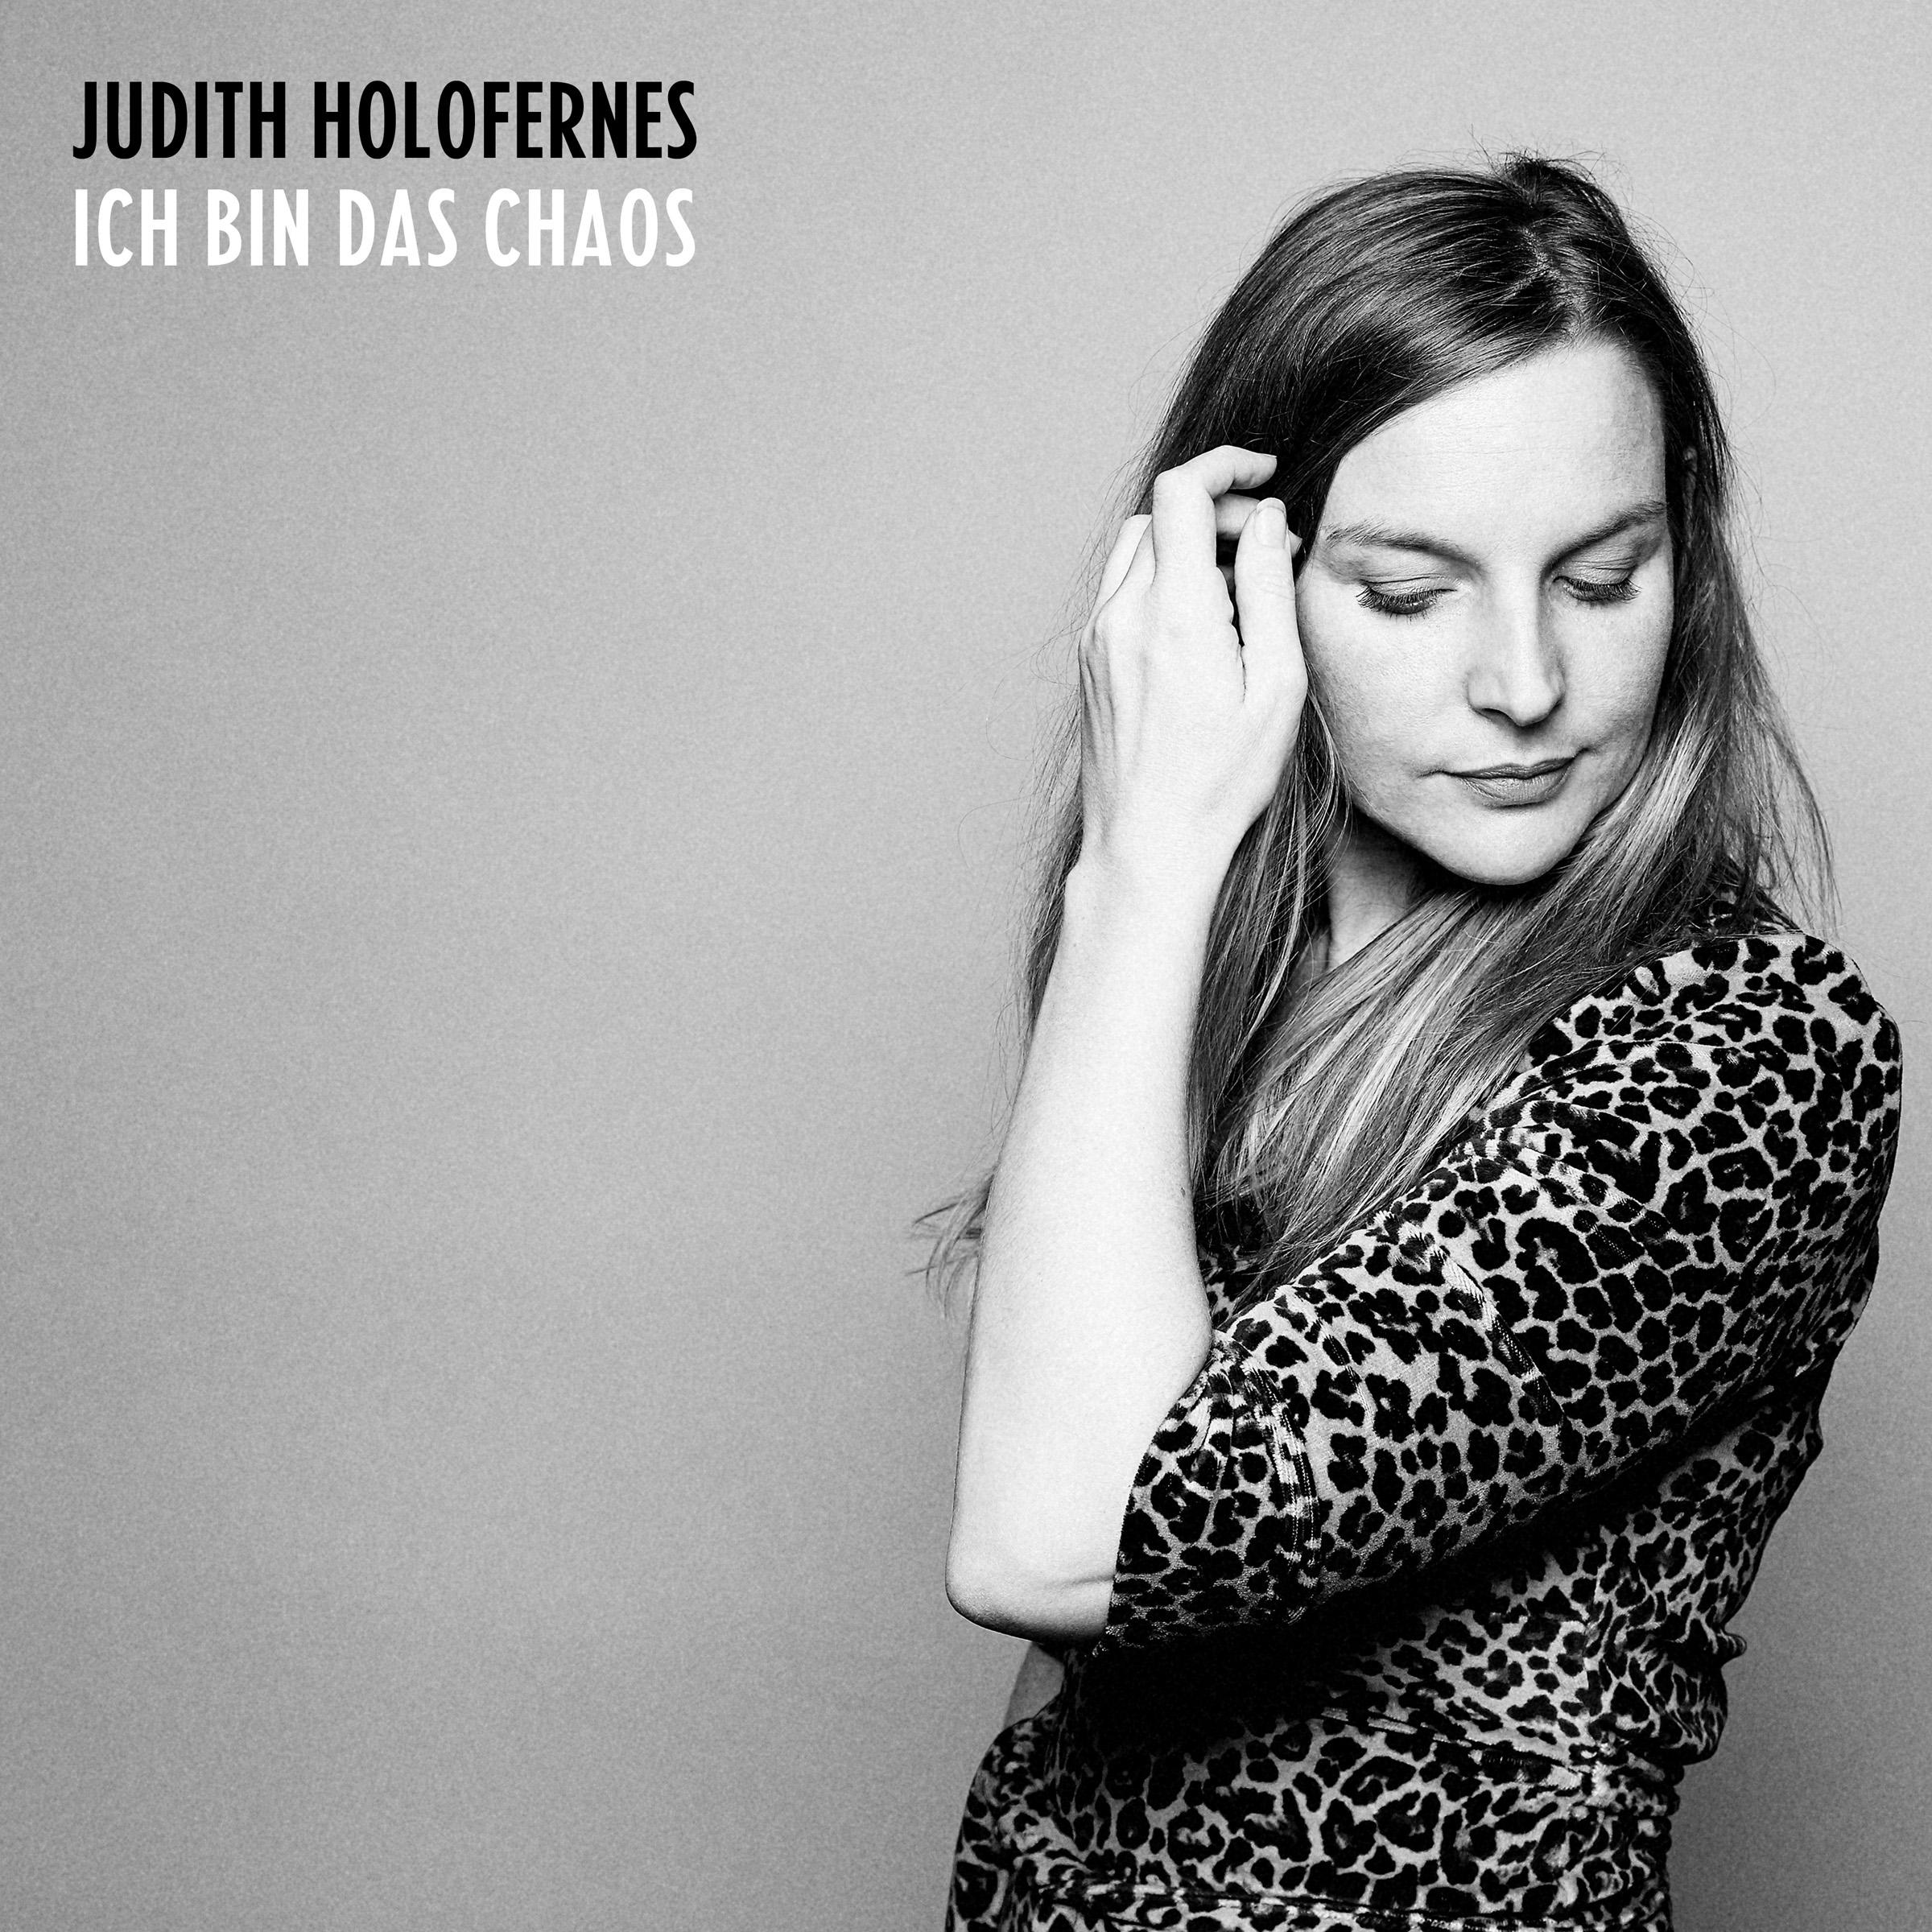 judith-holofernes